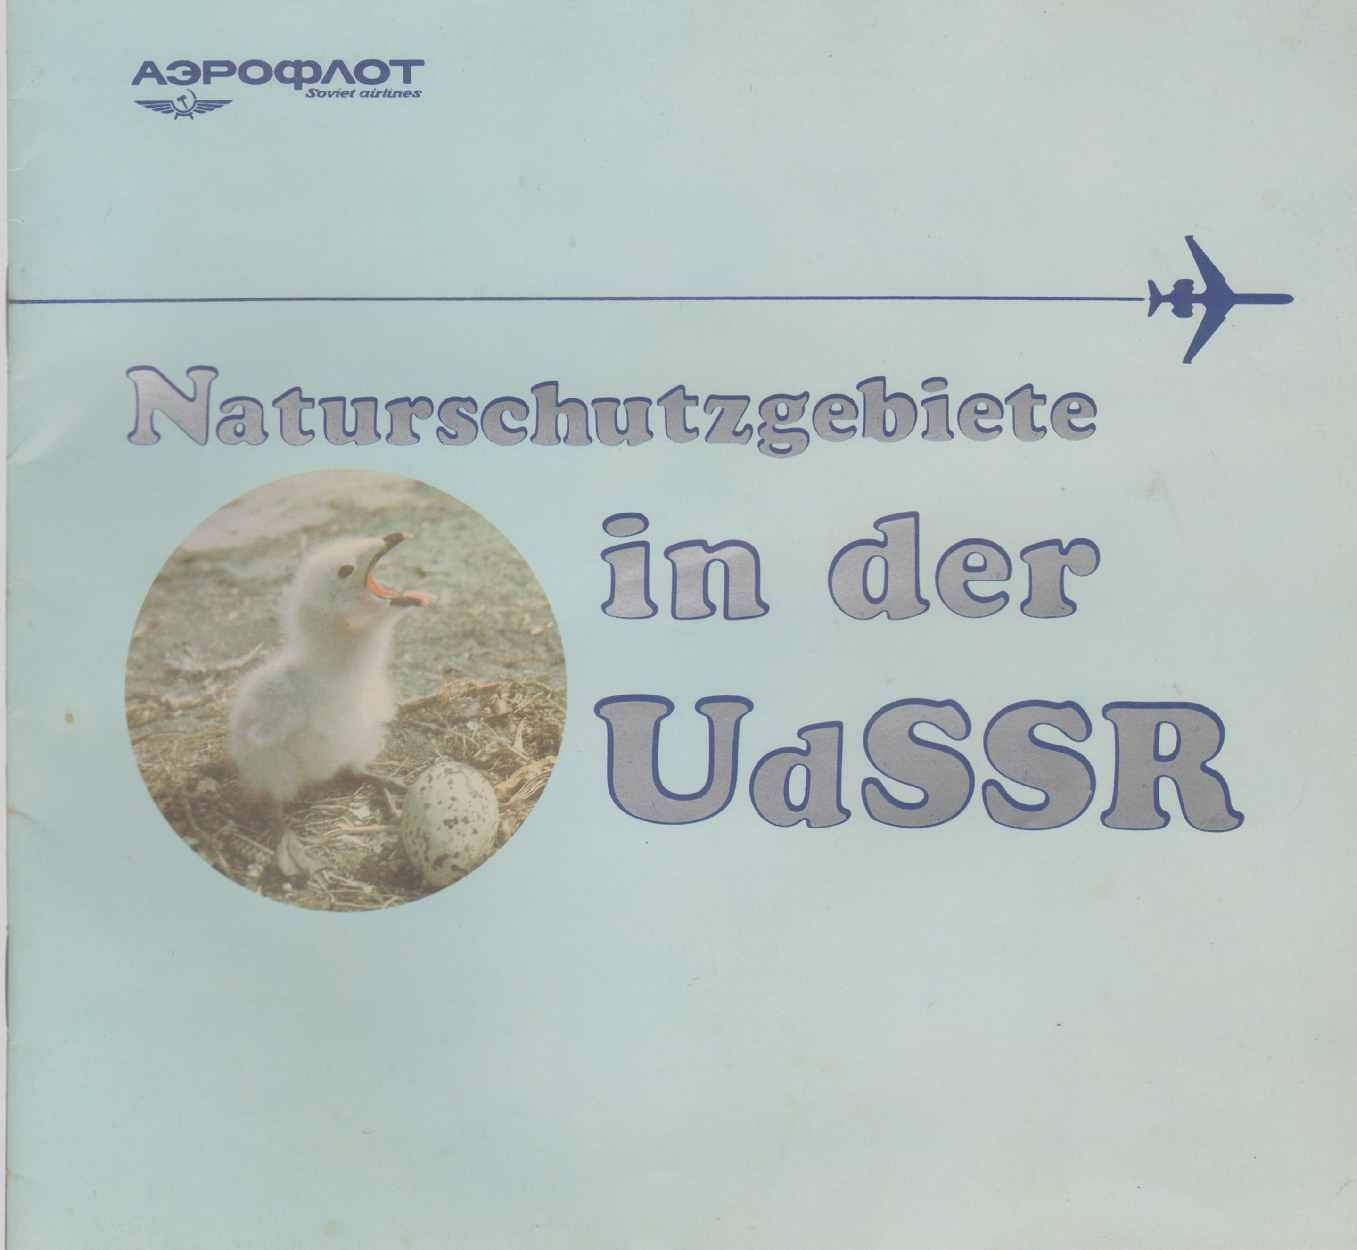 NATURSCHUTZGEBIETE IN DER USSR, Aeroflot